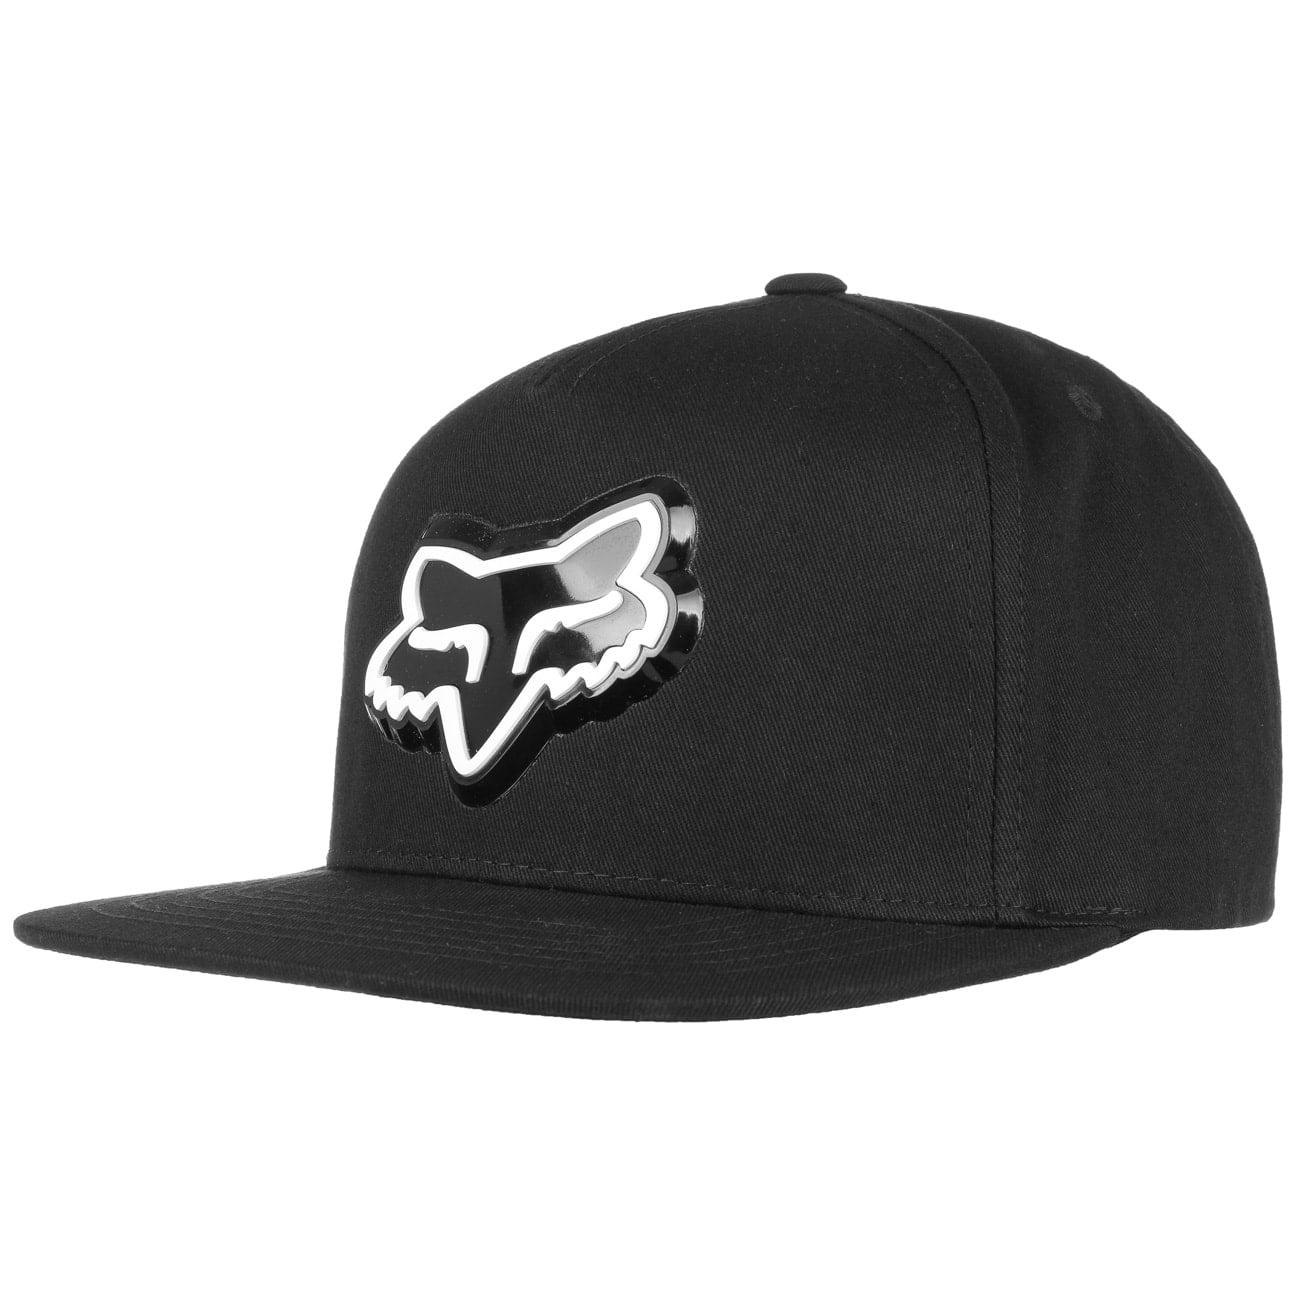 Casquette Snapback Ingratiate by FOX  baseball cap